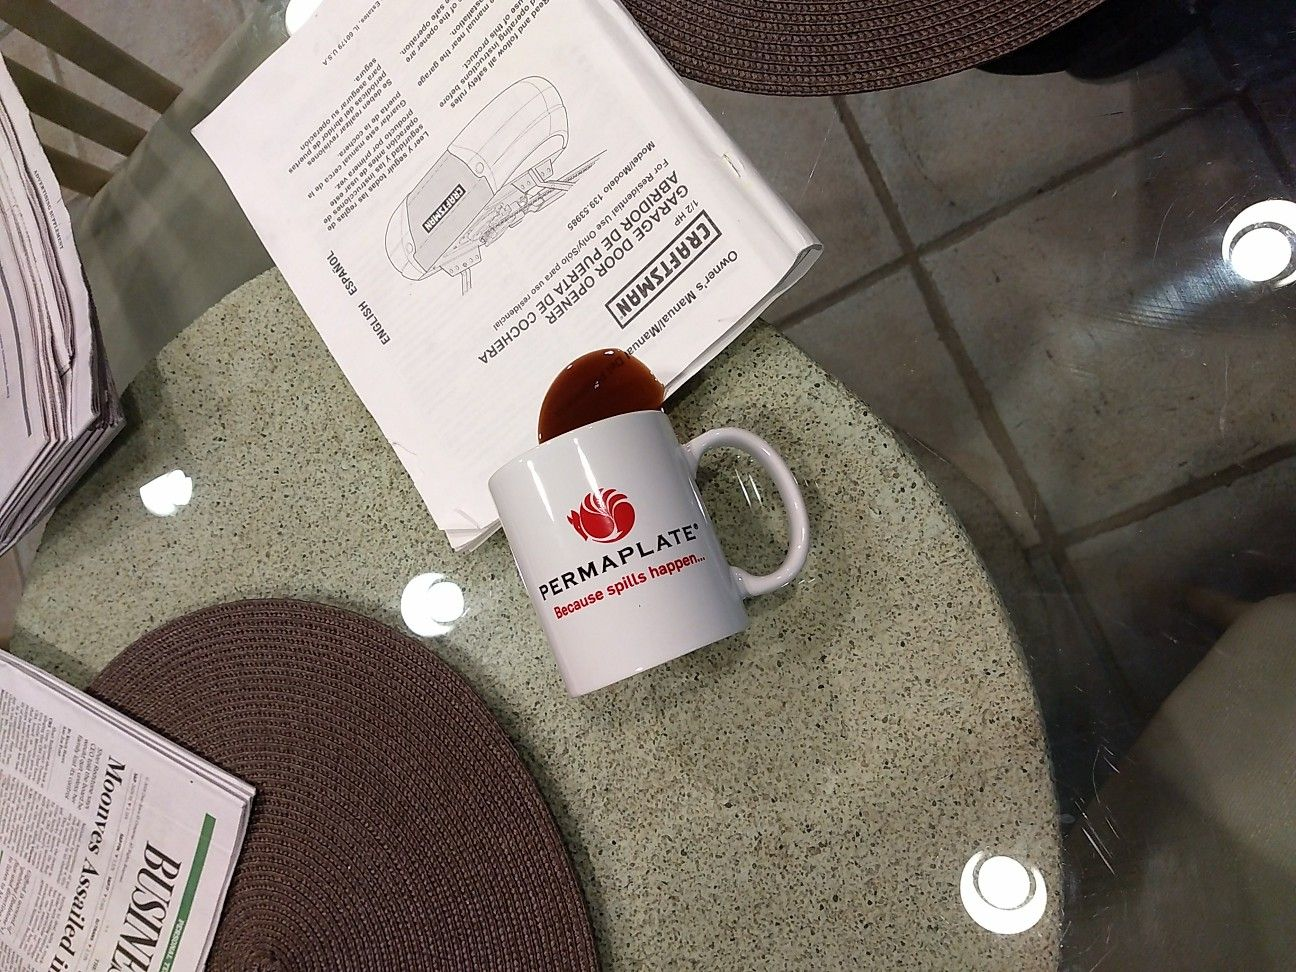 Awesome Coffee Shtick Whatsbrewinginthehousingmarketaskadambashein With Images Glassware Coffee Mugs